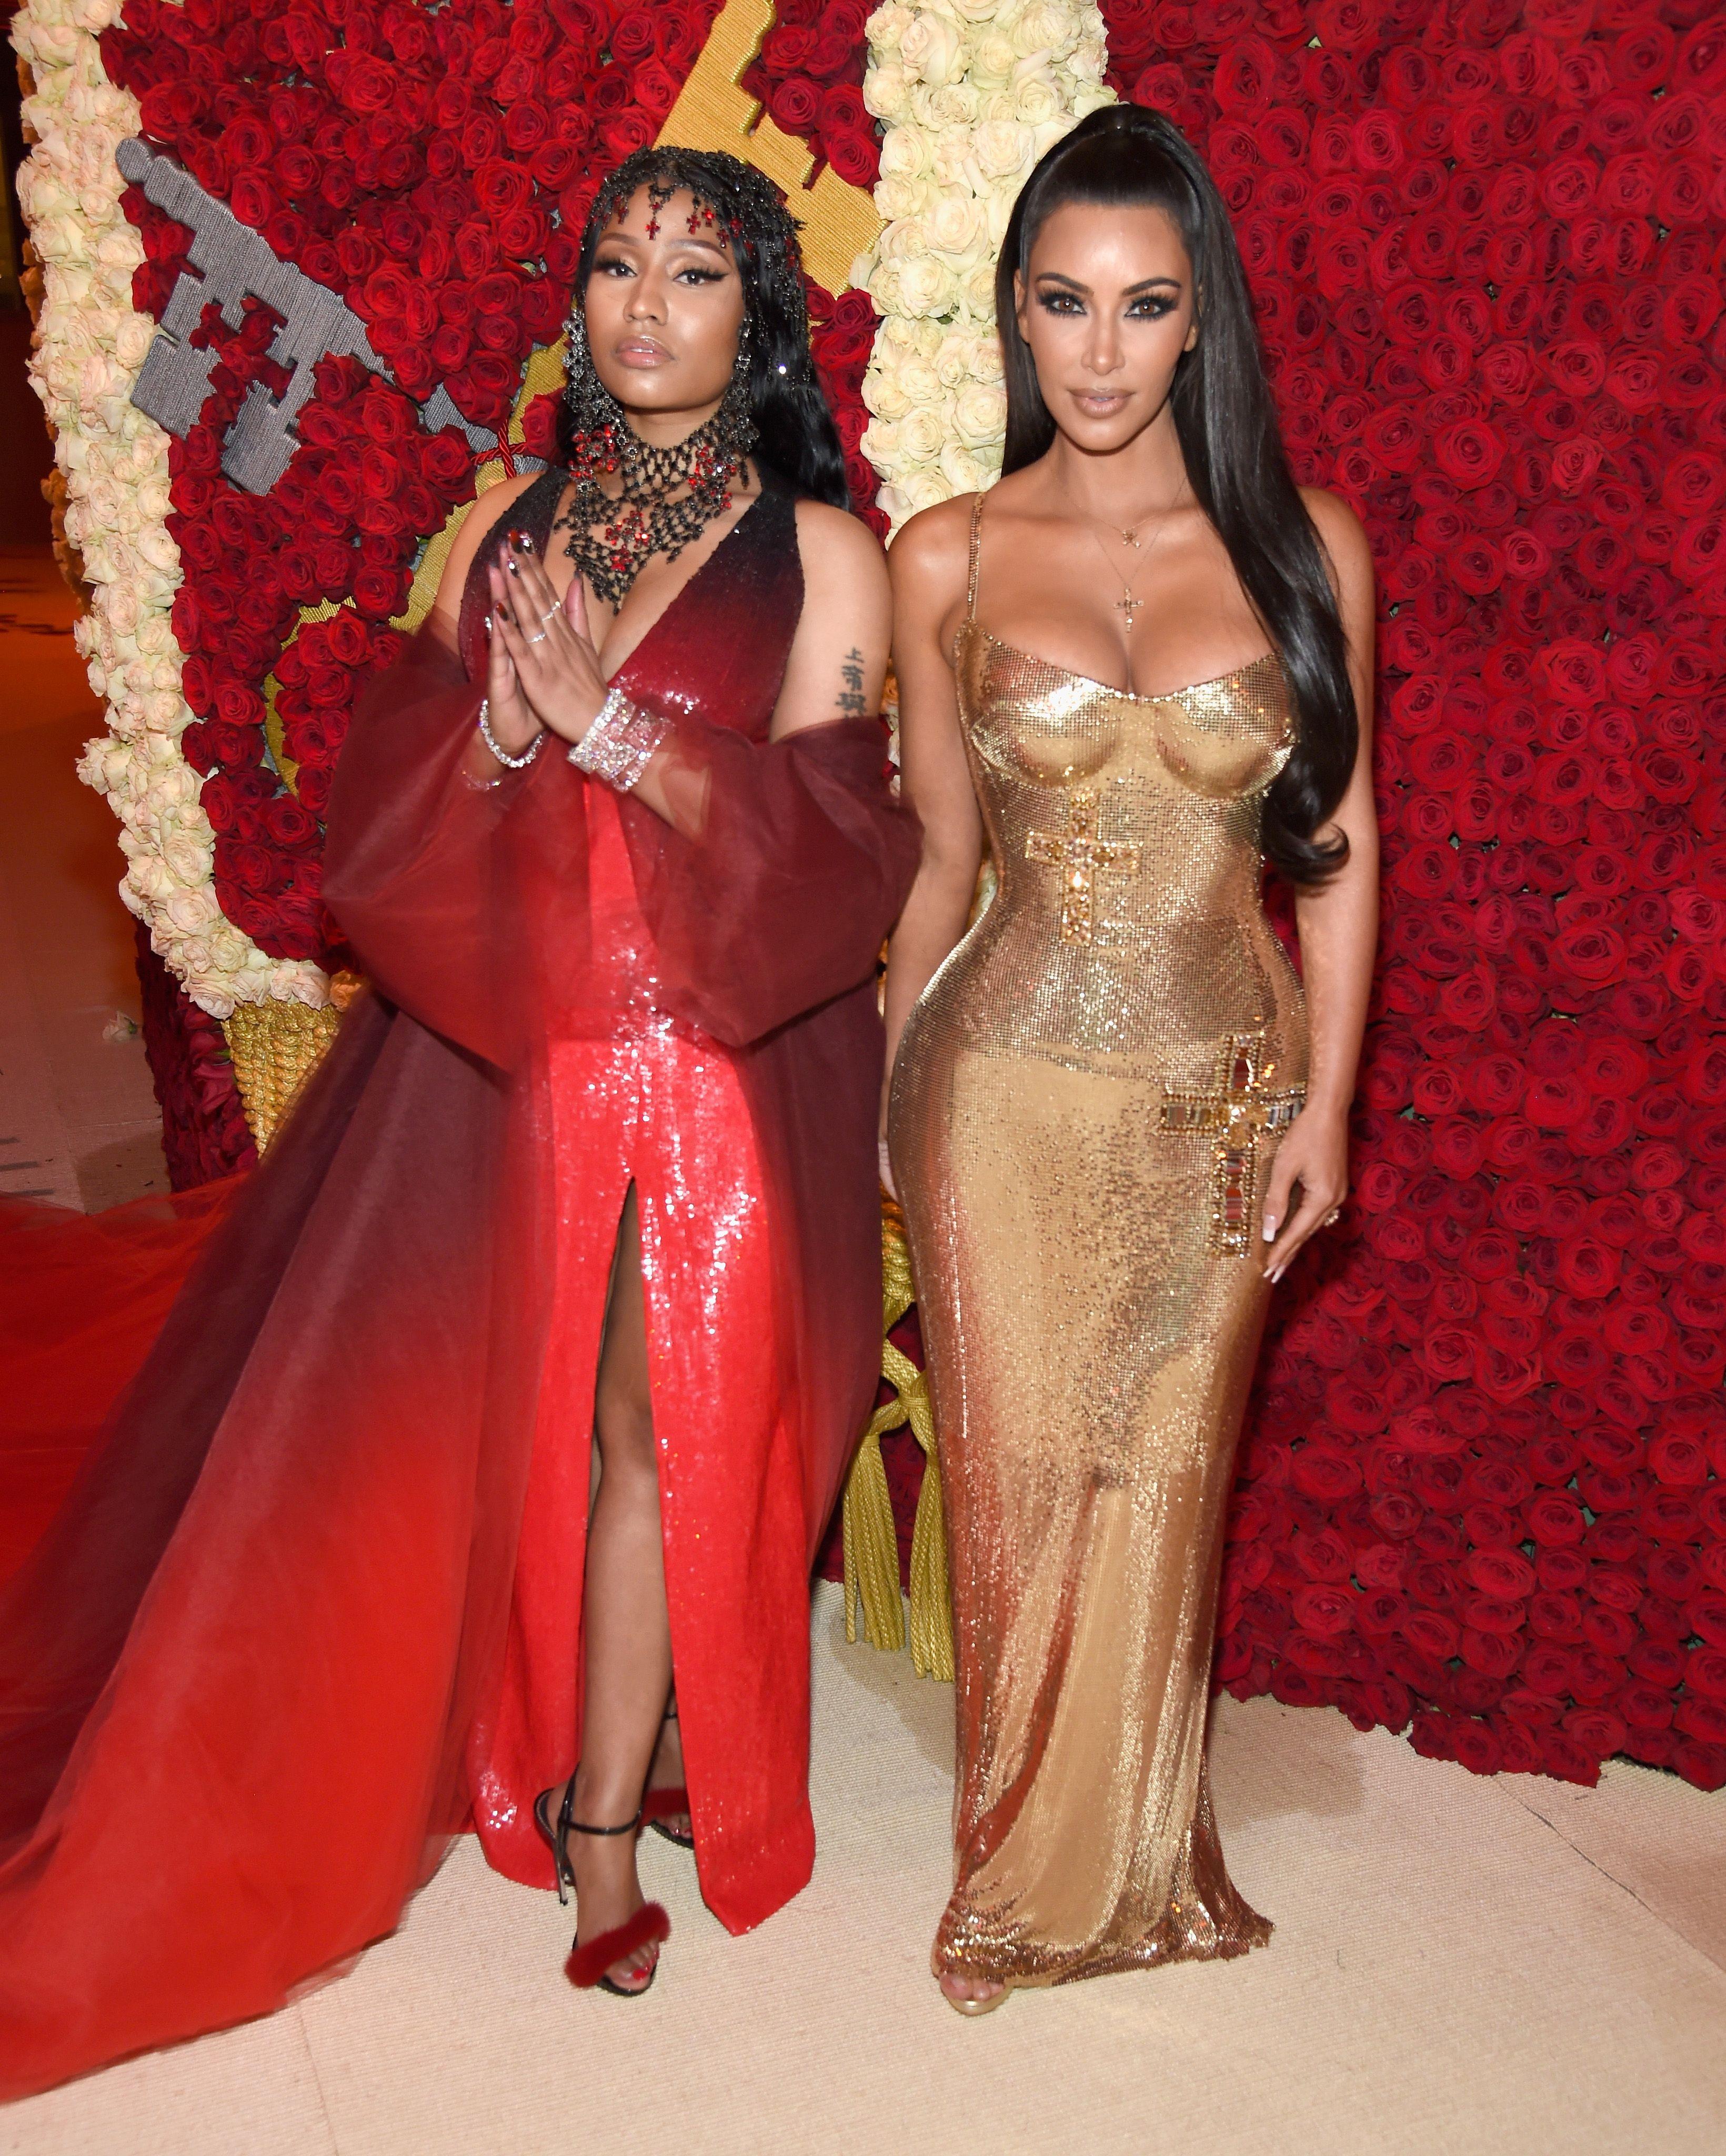 Nicki Minaj Gave North West the Cutest Gift When She Was Born, Kim Kardashian Revealed